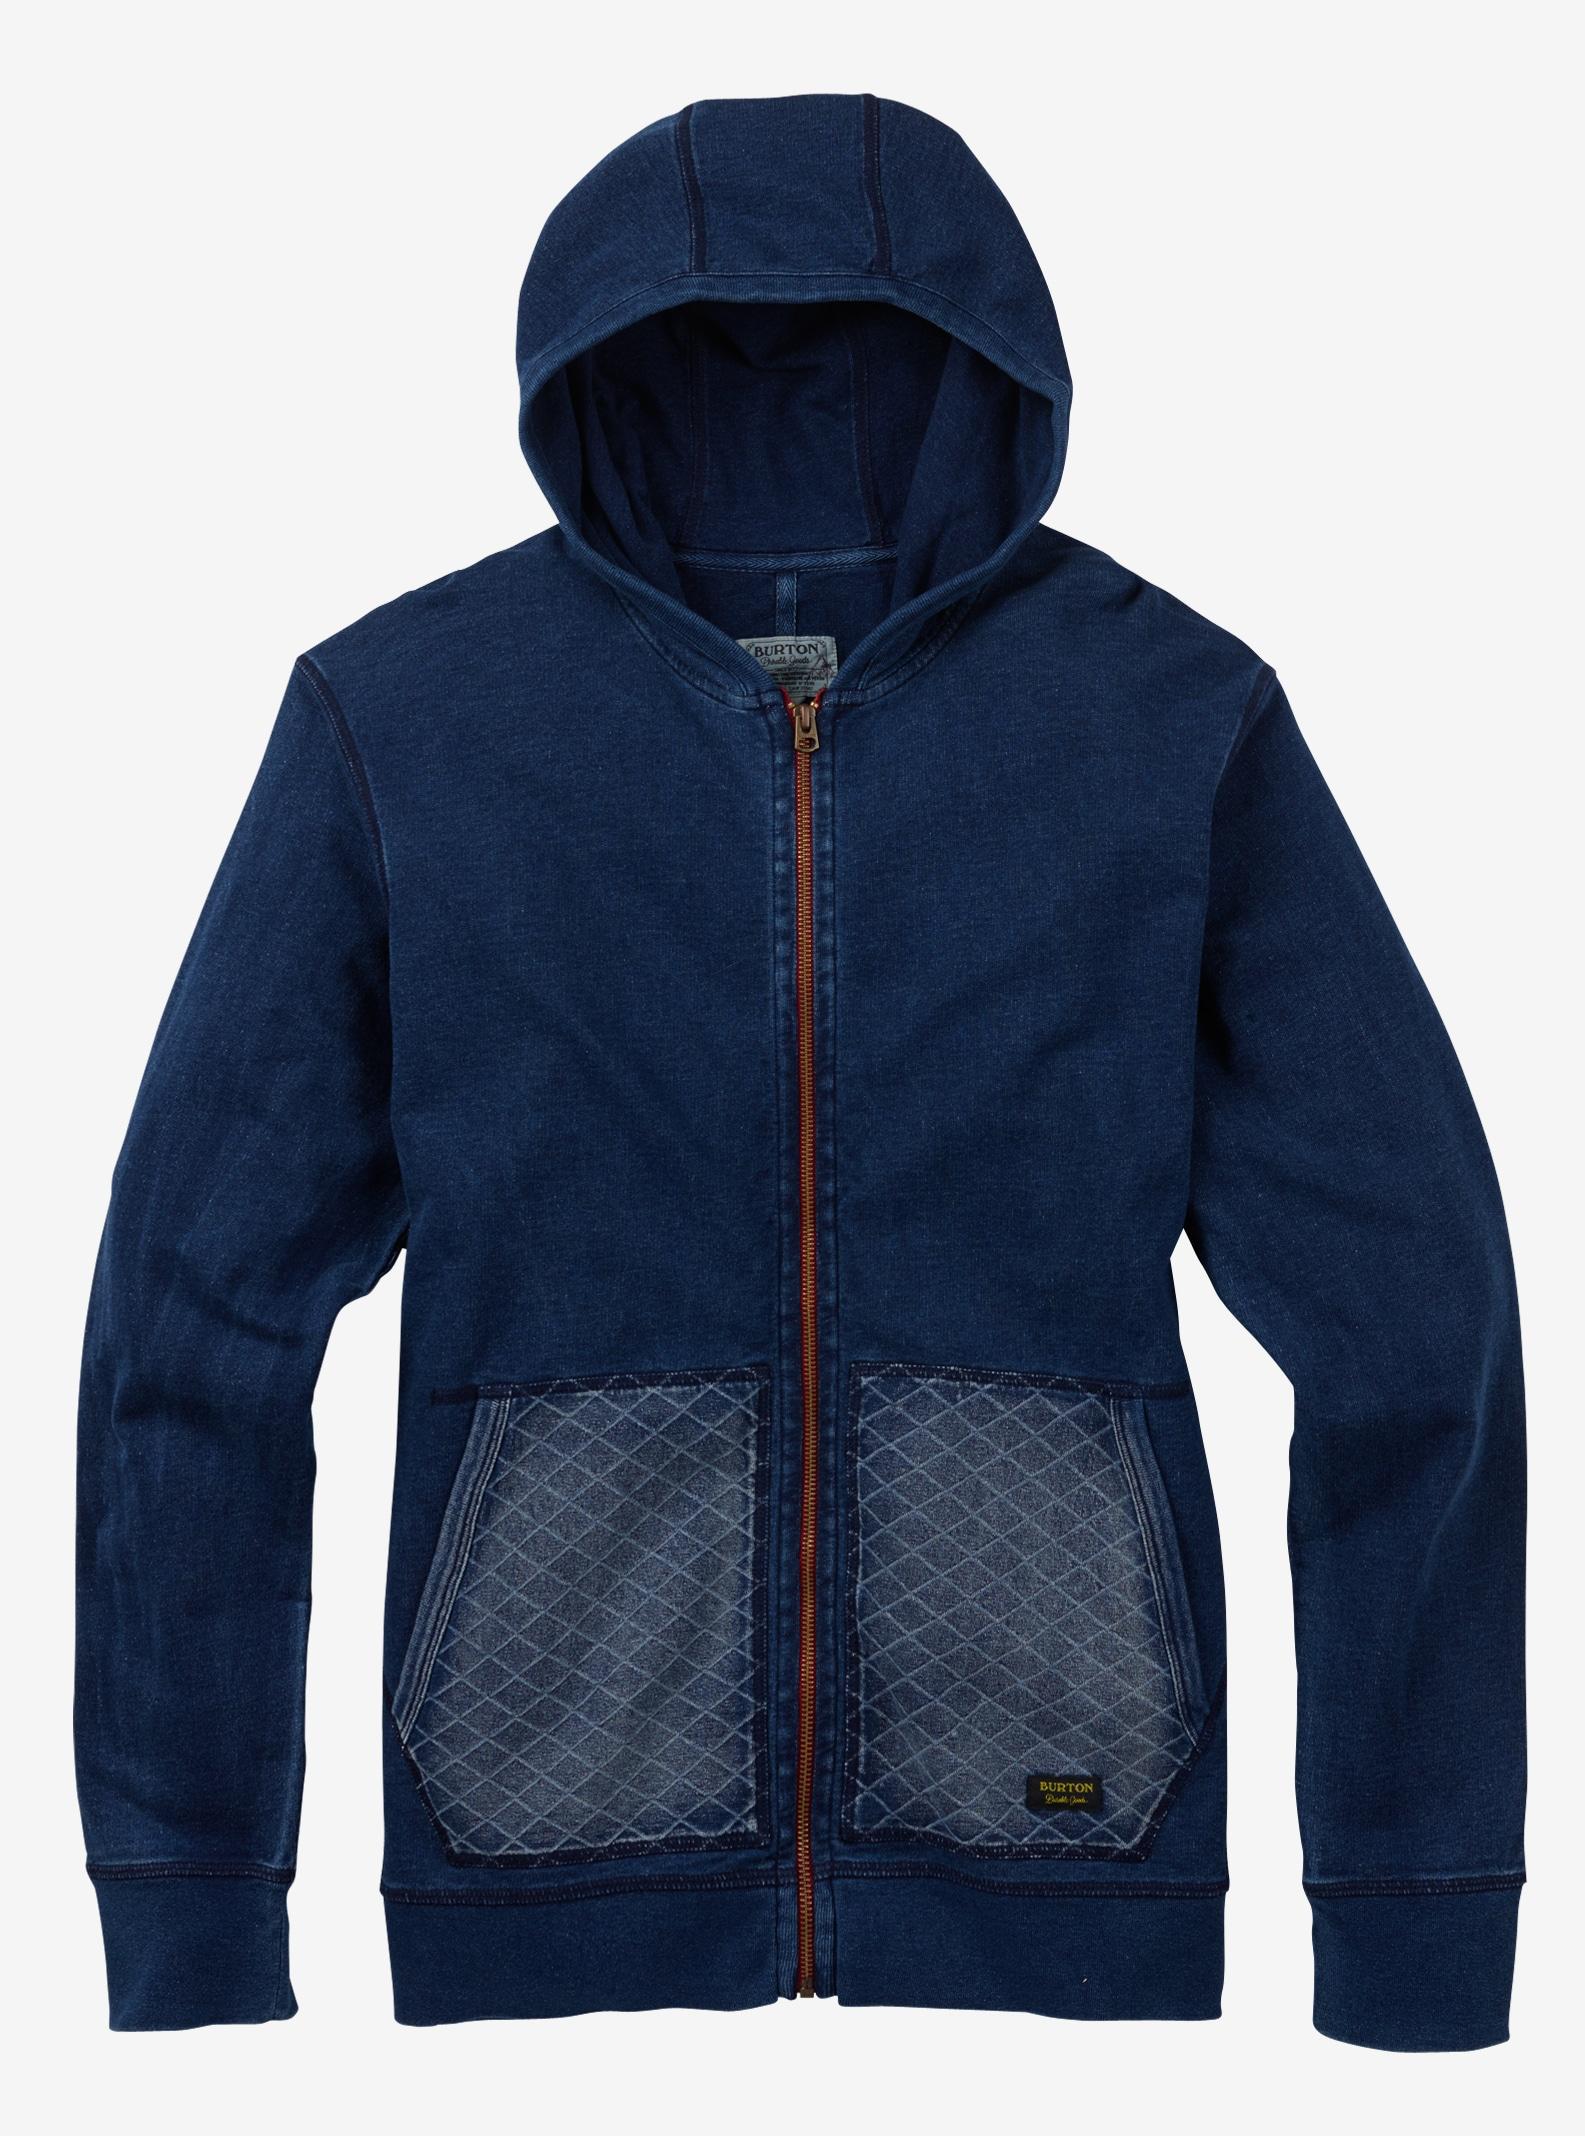 Burton Monhegan Fleece Full-Zip shown in Indigo